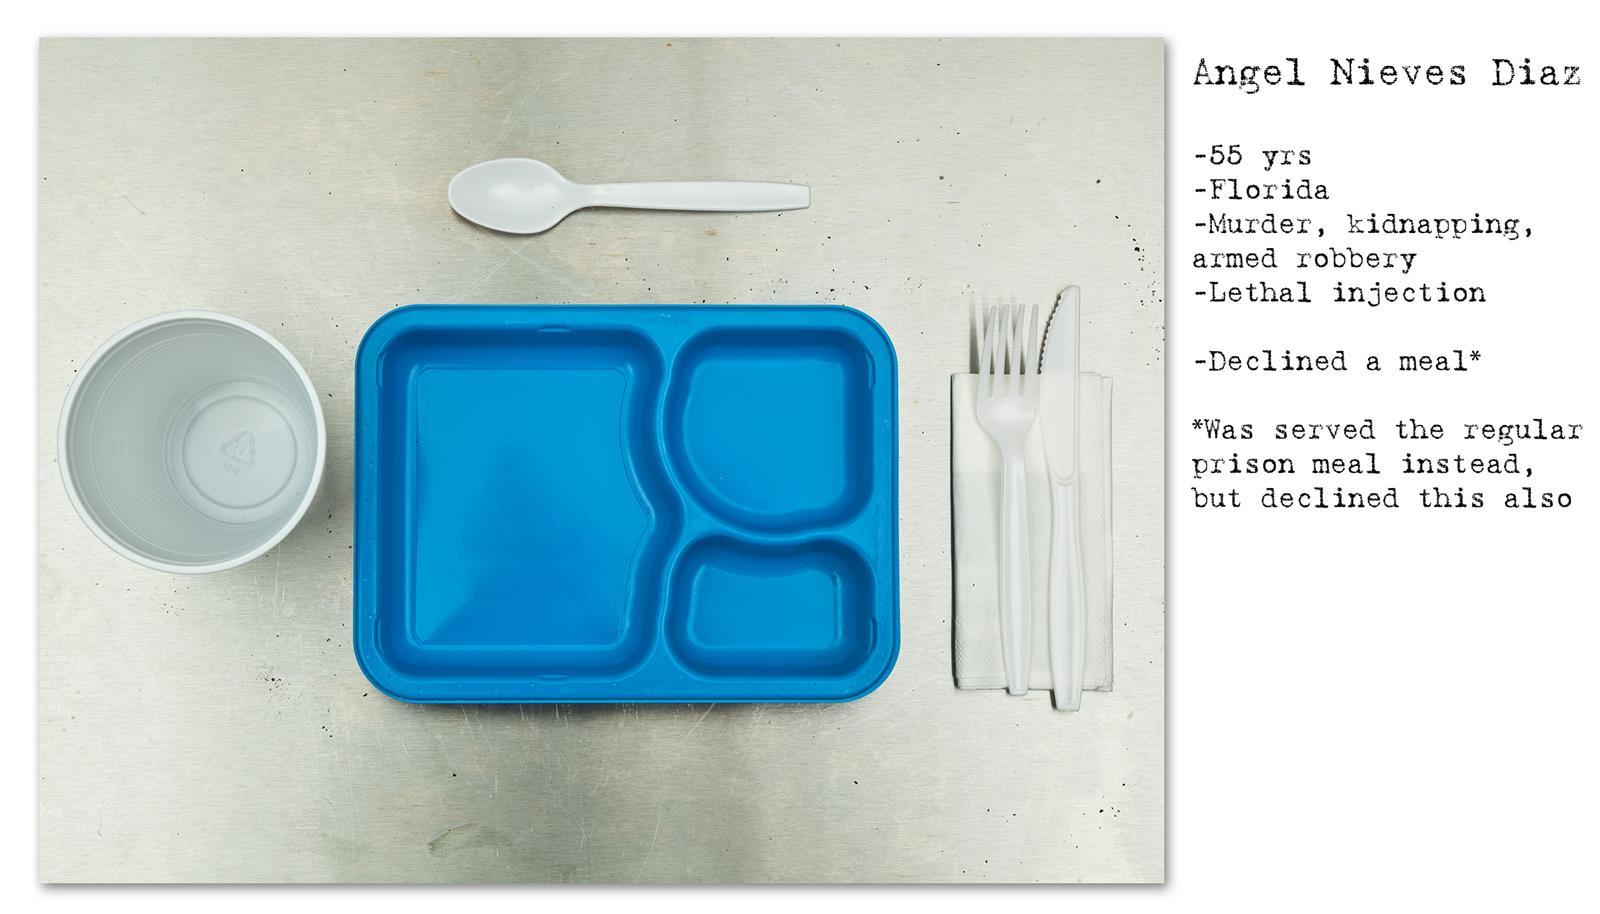 Death Row Prisoner's Last Meal (4)